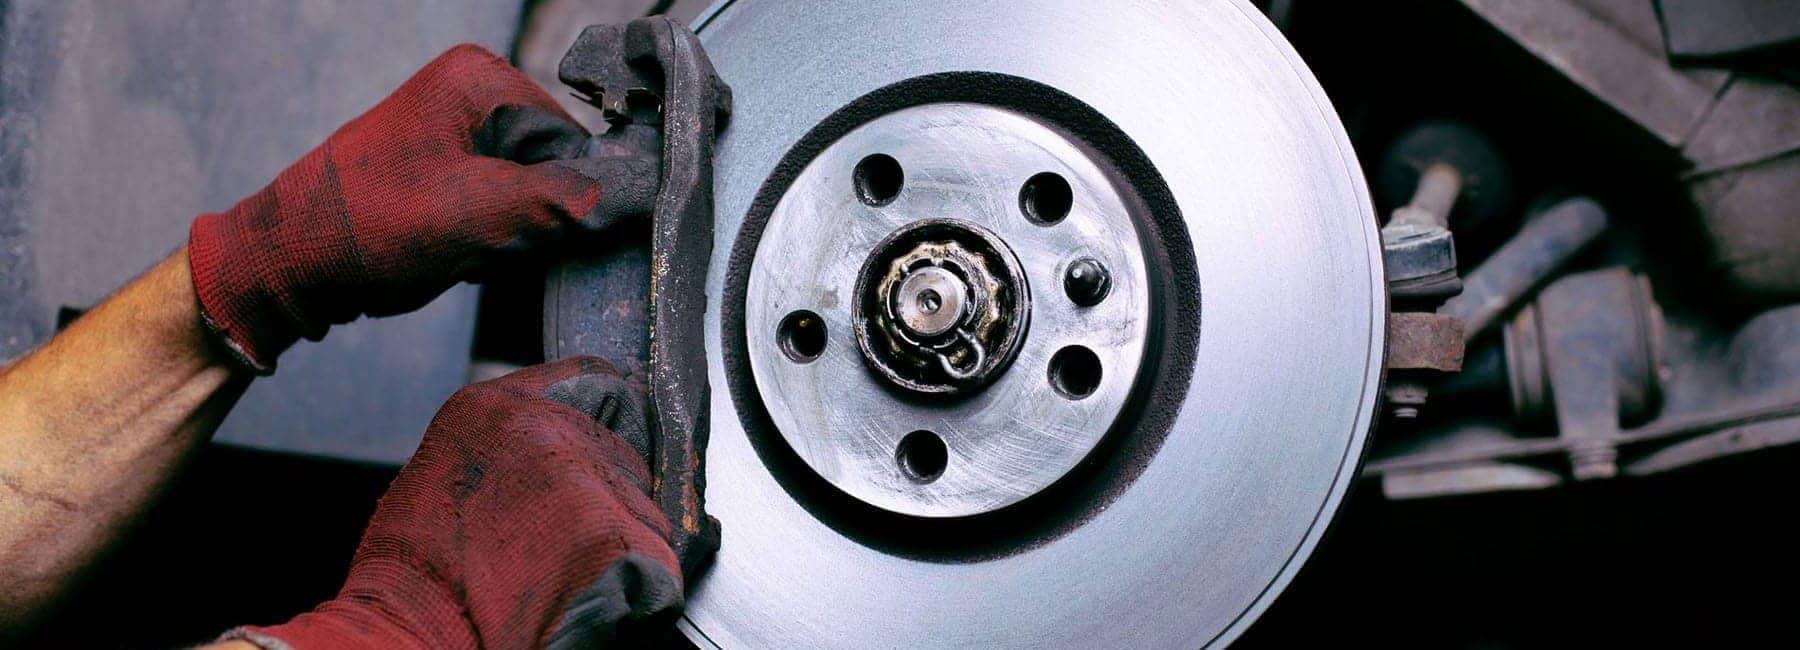 Mechanic replacing the brake pad on a car